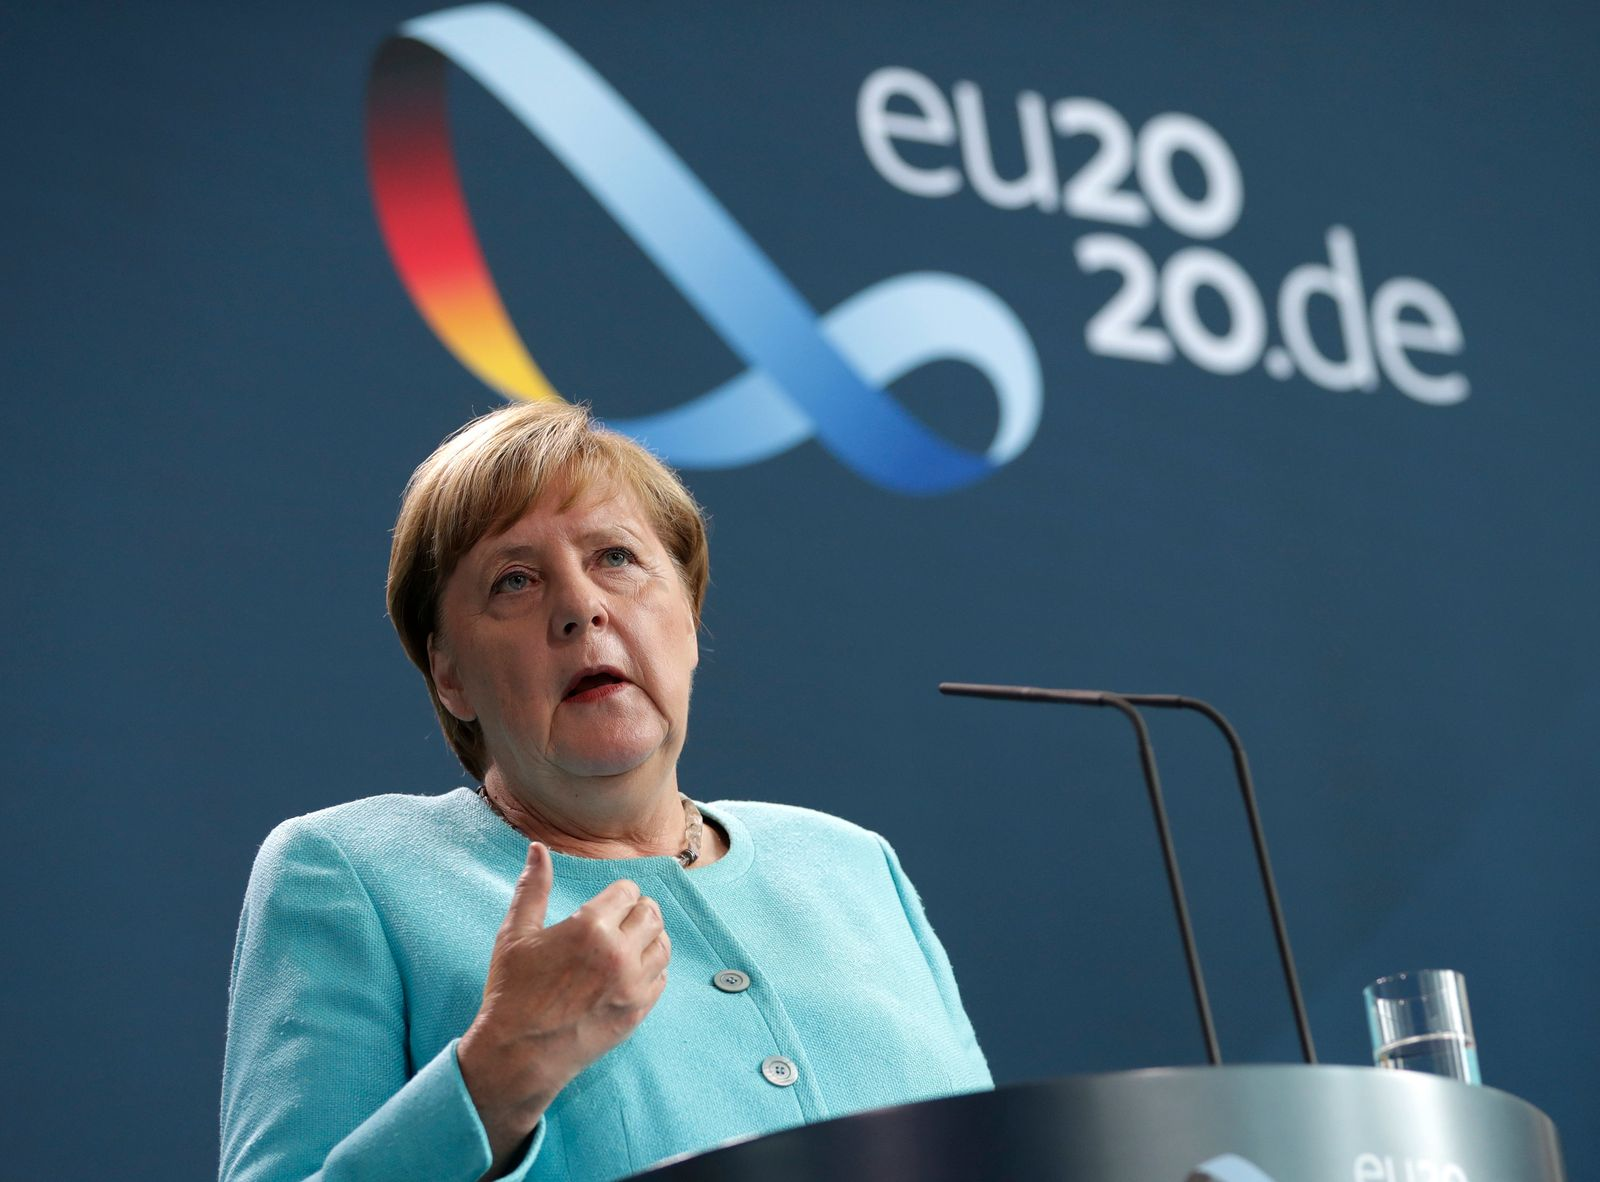 Merkel zu Schuldenaufnahme in der EU